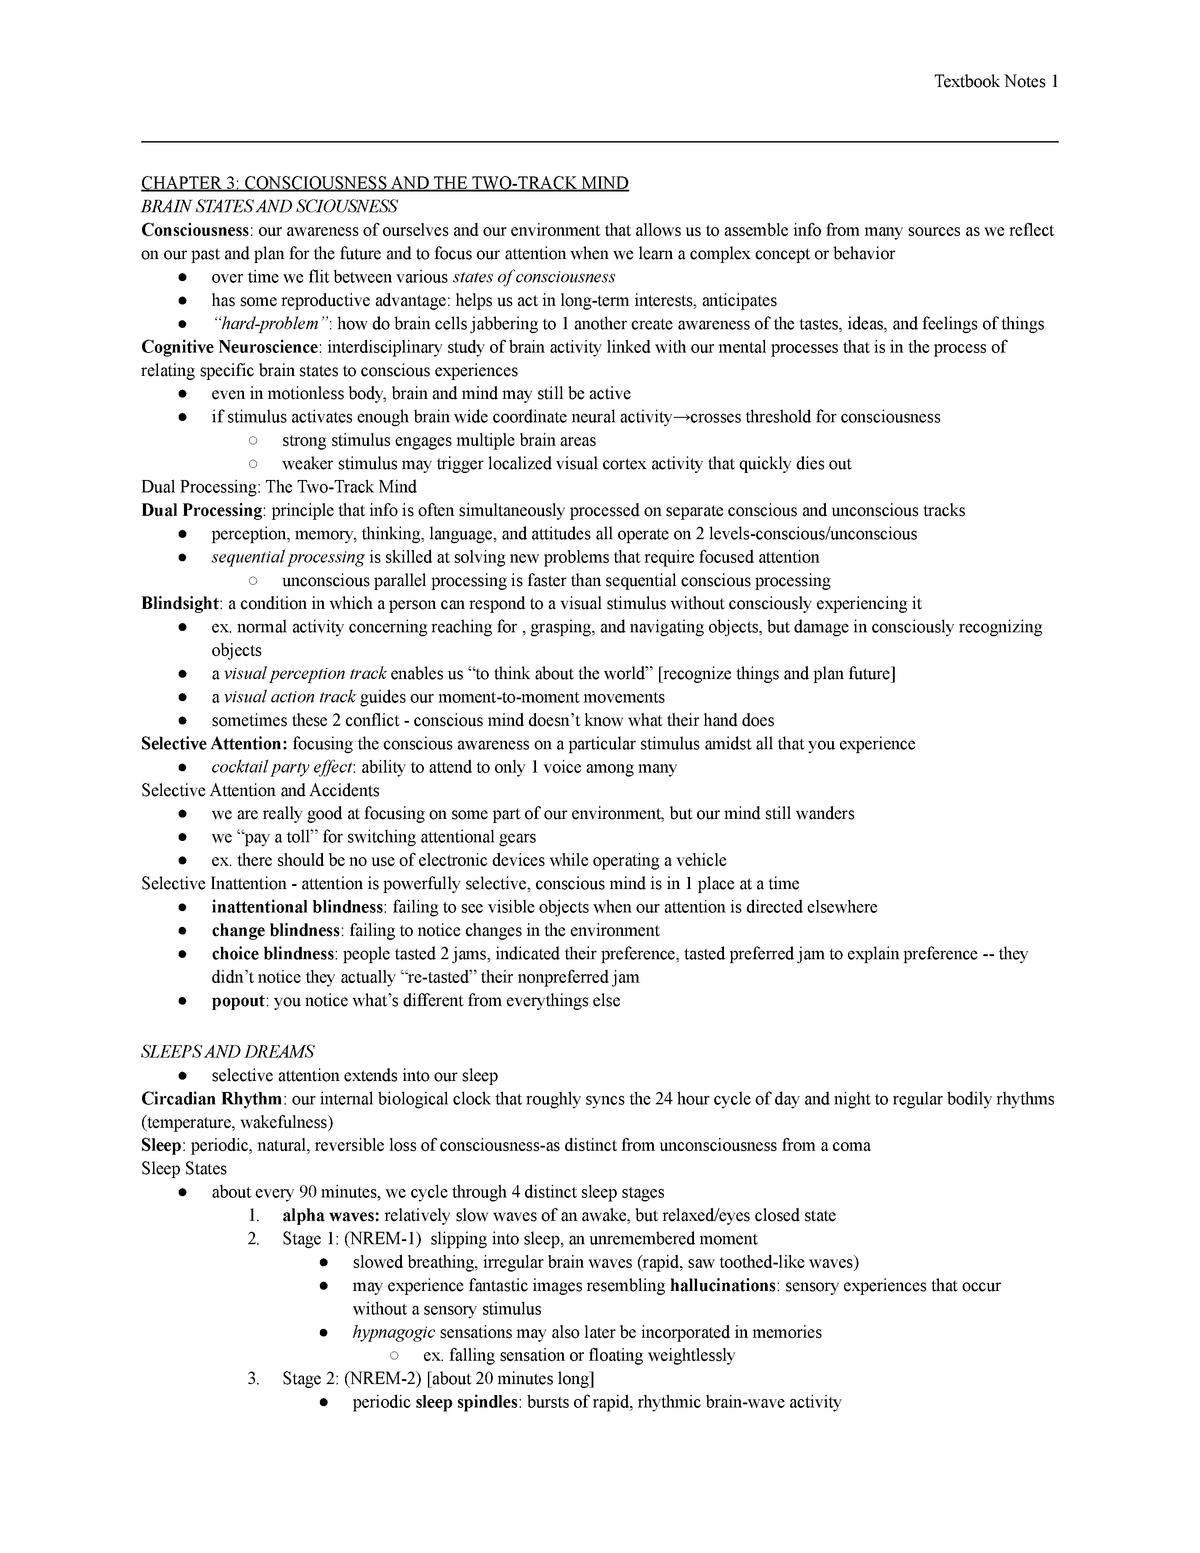 Exam 2 - Summary Psychology - PSYC 111 - StuDocu